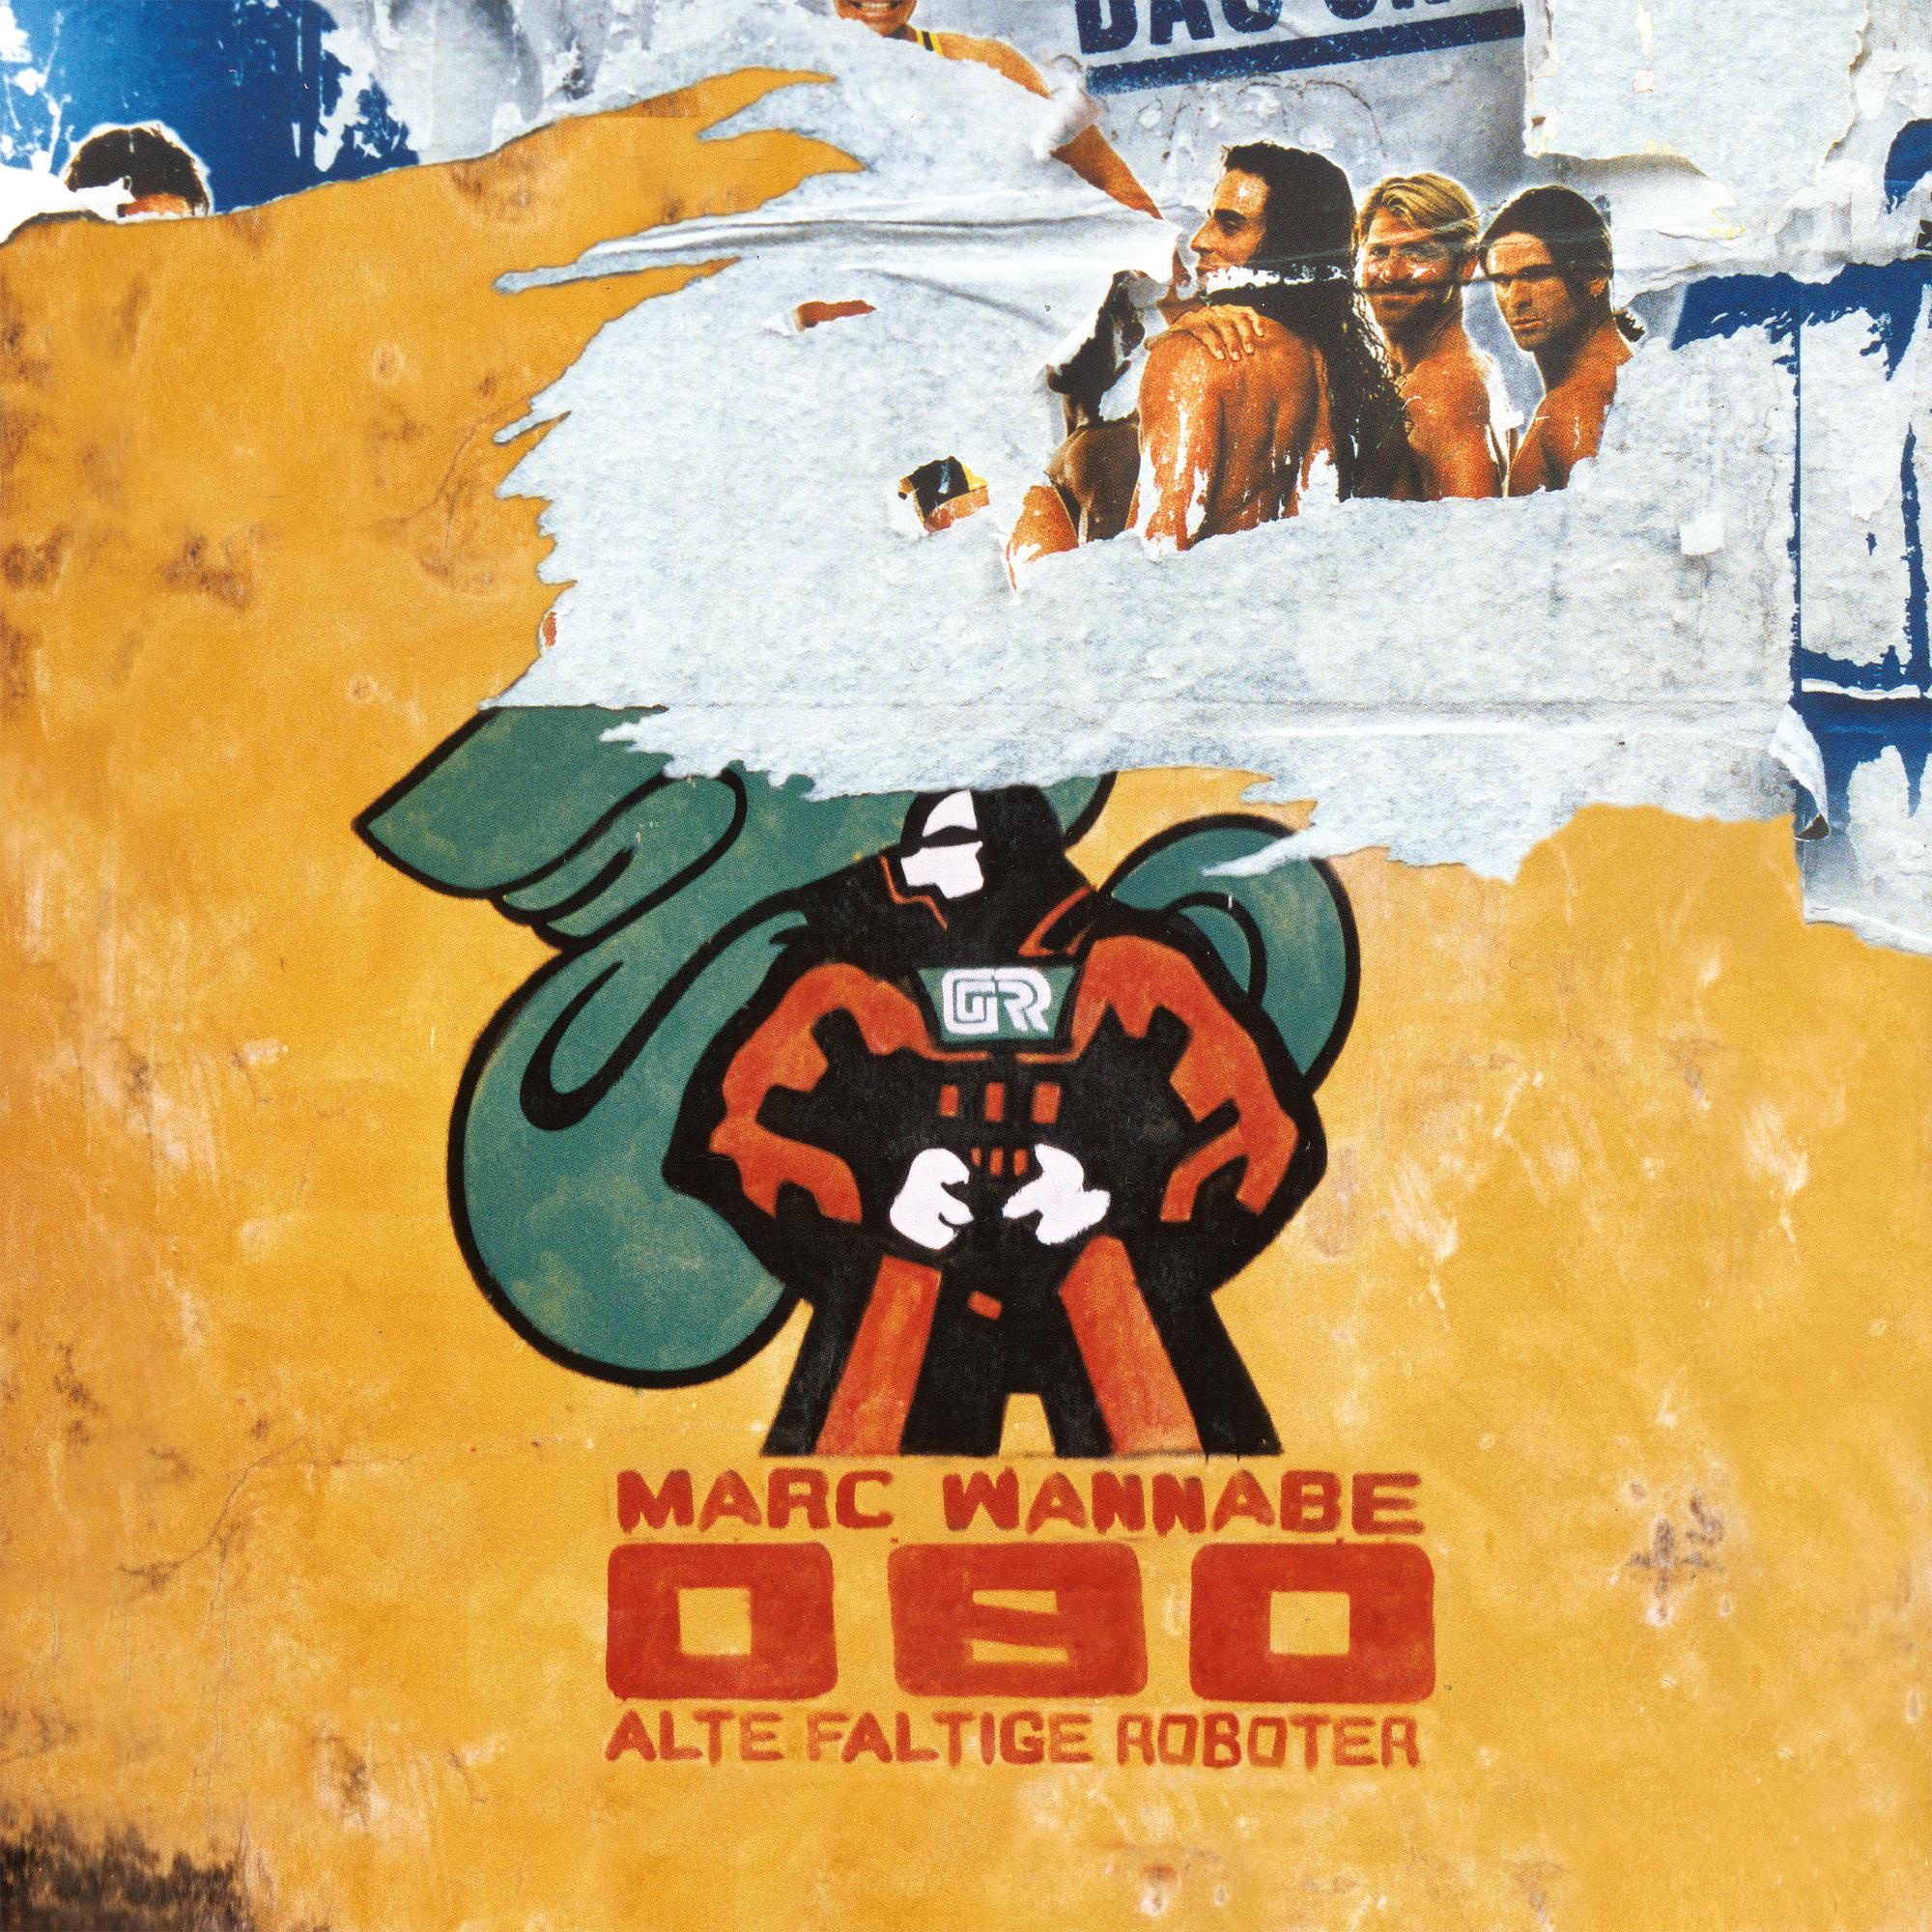 Marc Wannabe - Alte Faltige Roboter